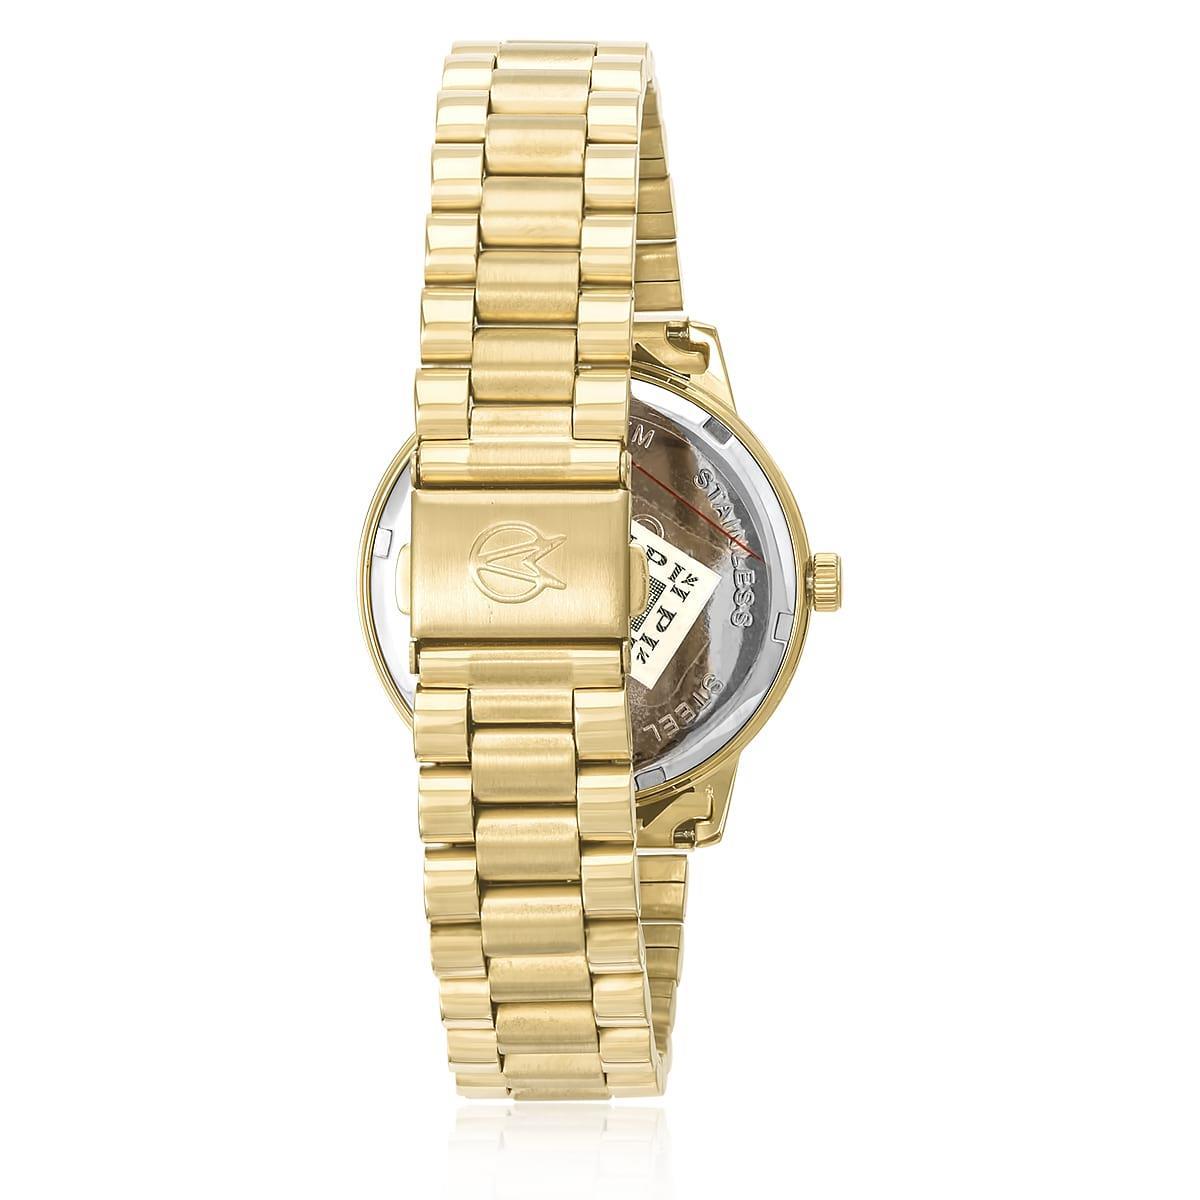 dc909dfa39e Relógio Feminino Champion Elegance Analógico CN25092F Fundo azul turquesa